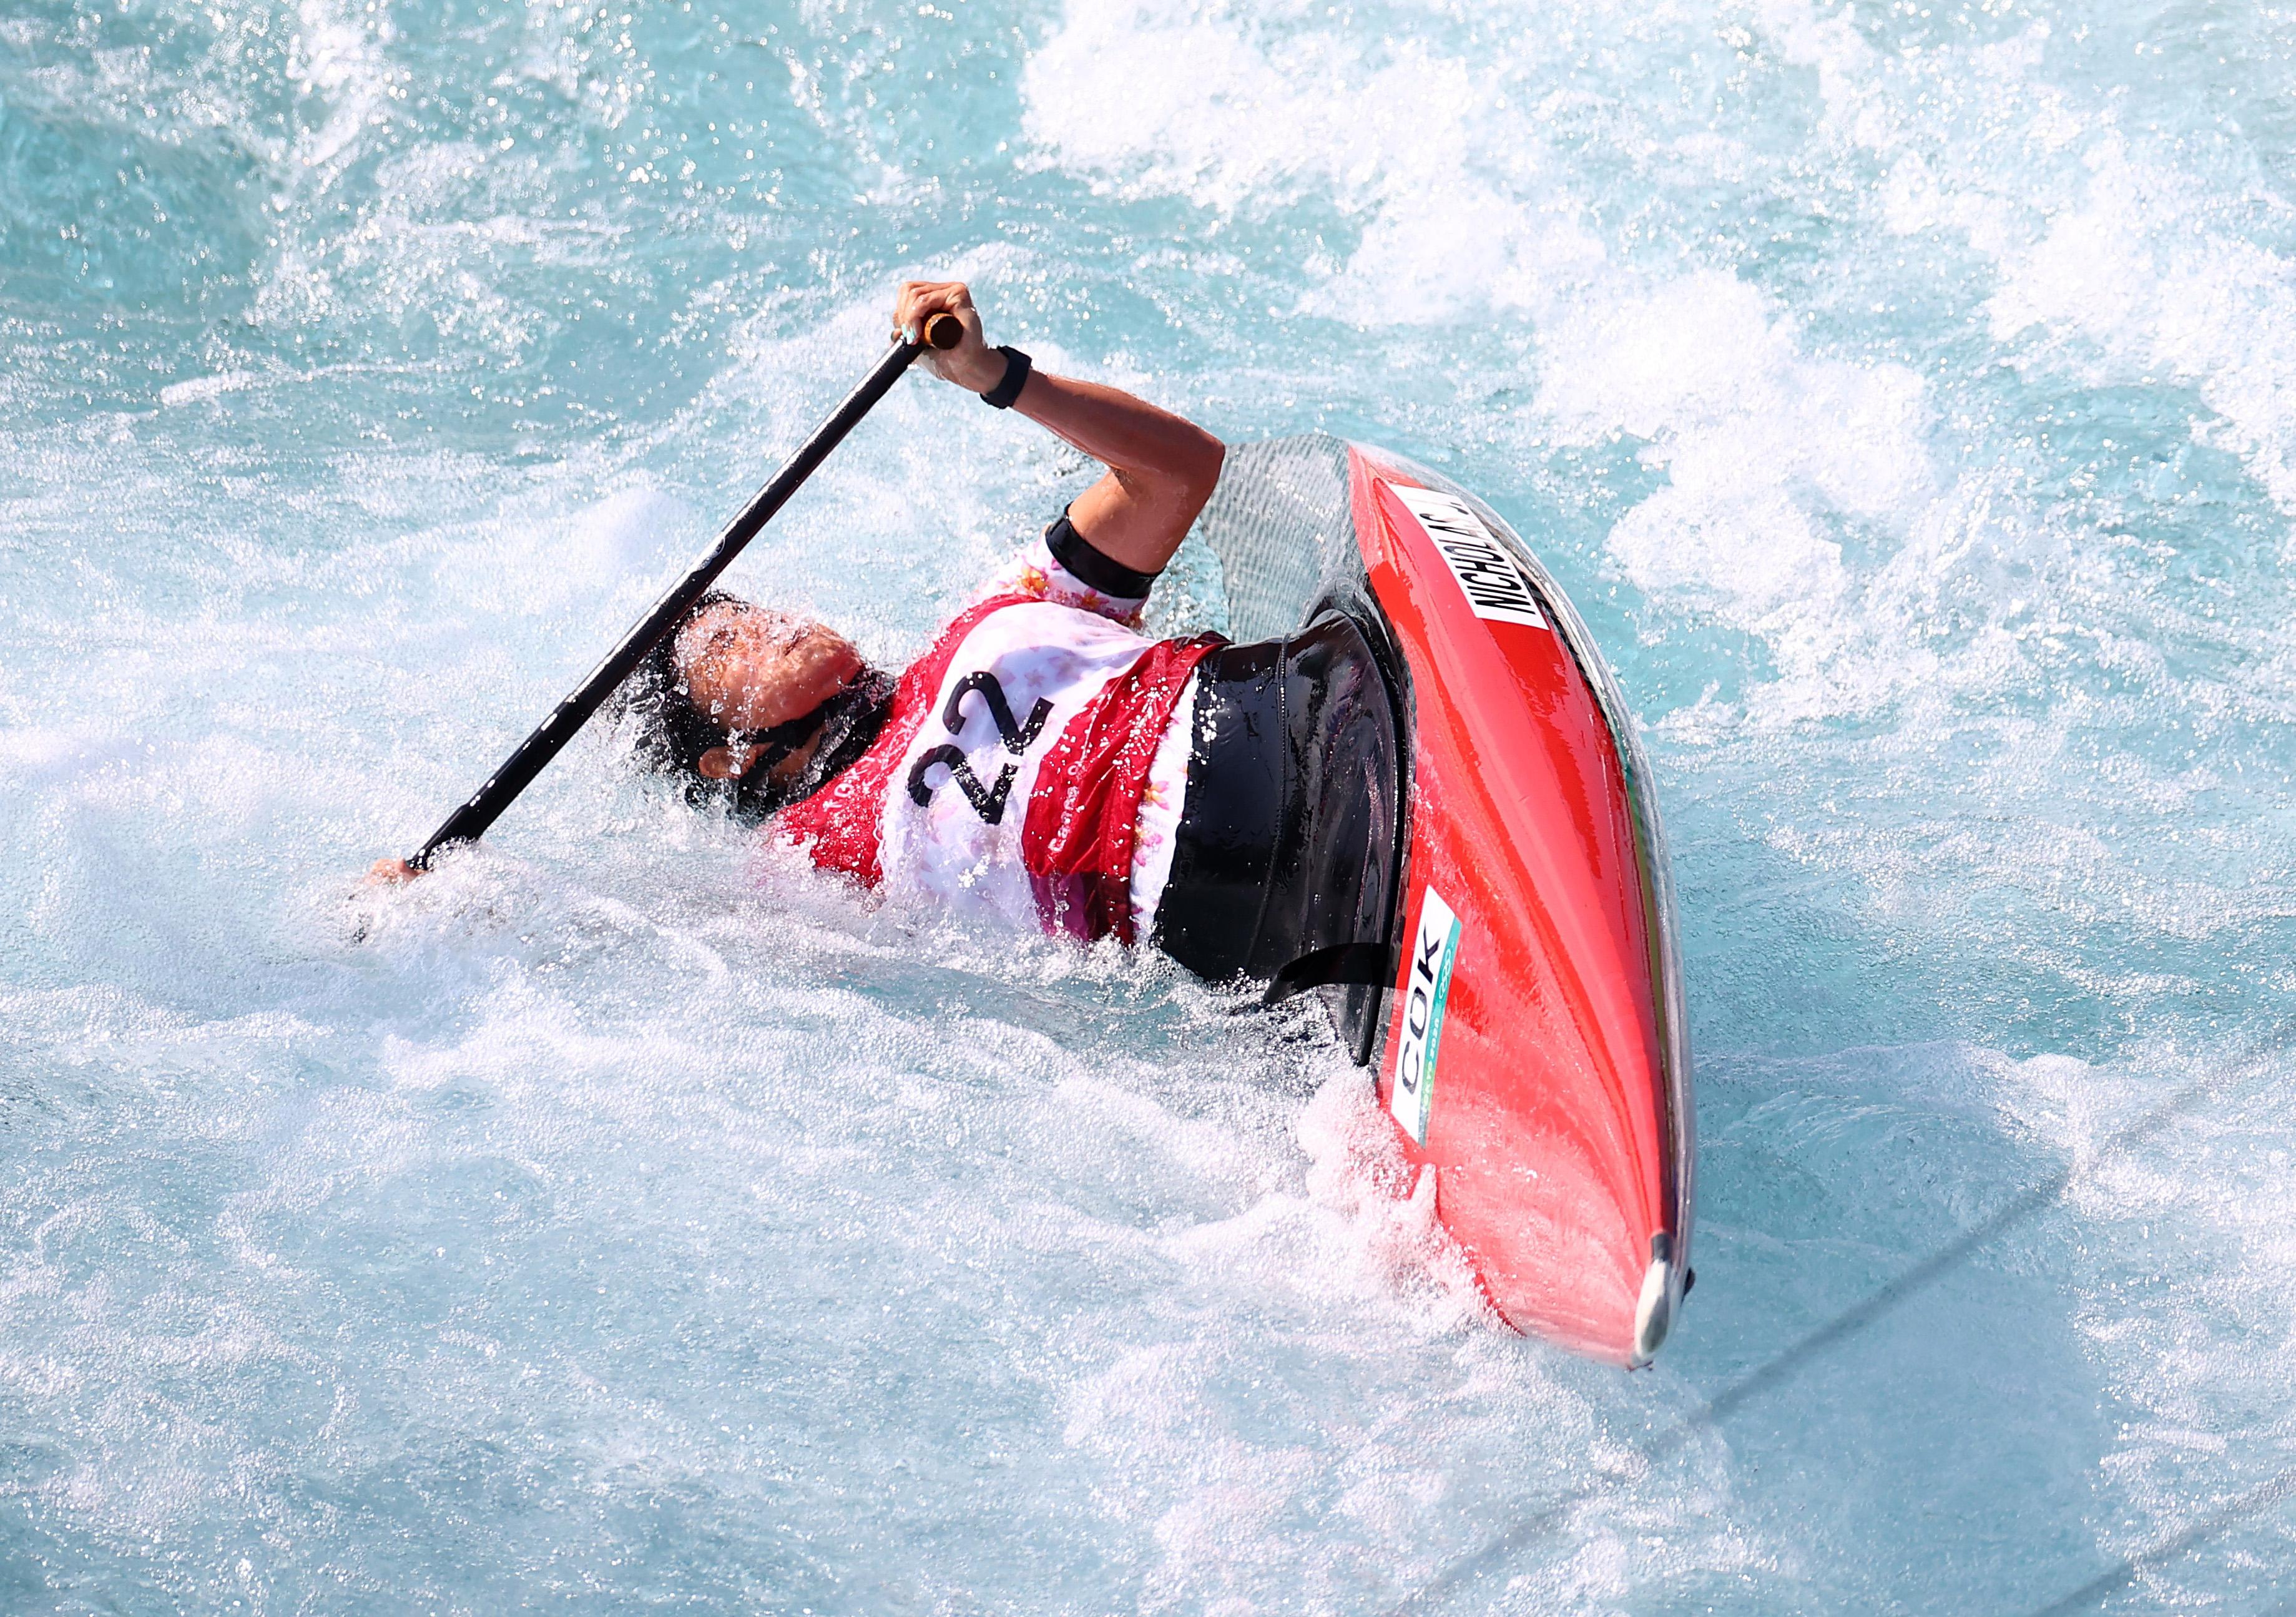 Tokyo 2020 Olympics - Canoe Slalom - Women's C1 - Heats - Kasai Canoe Slalom Centre, Tokyo, Japan - July 28, 2021. Jane Nicholas of the Cook Islands in action REUTERS/Yara Nardi